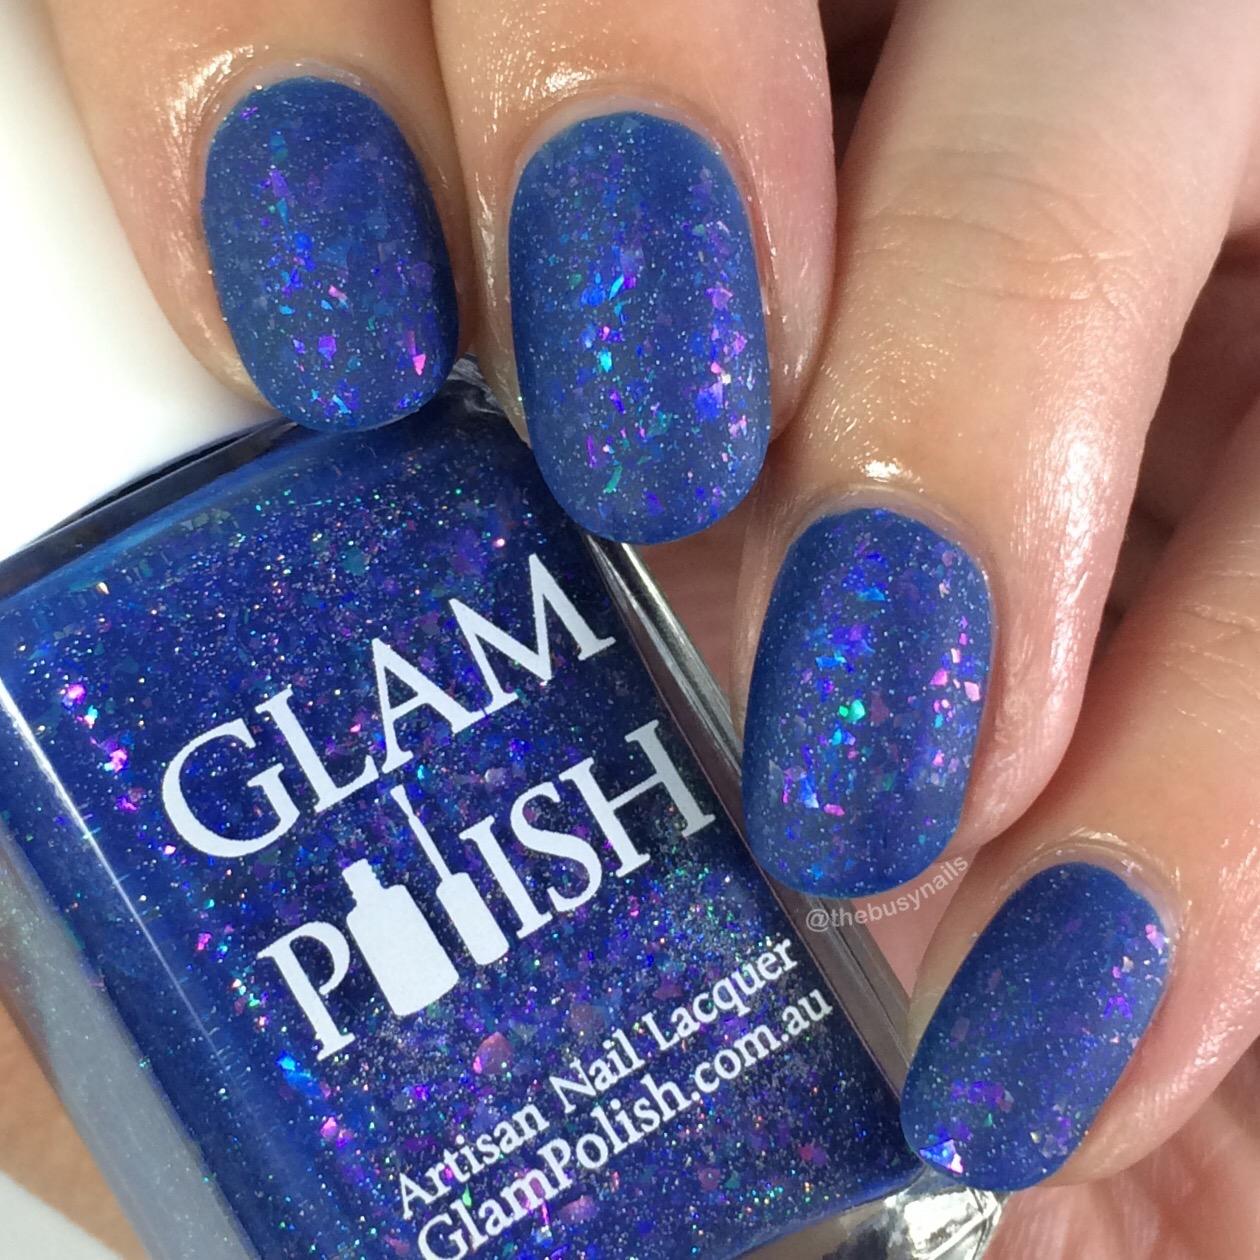 glam-polish-just-keep-swimming1.jpg